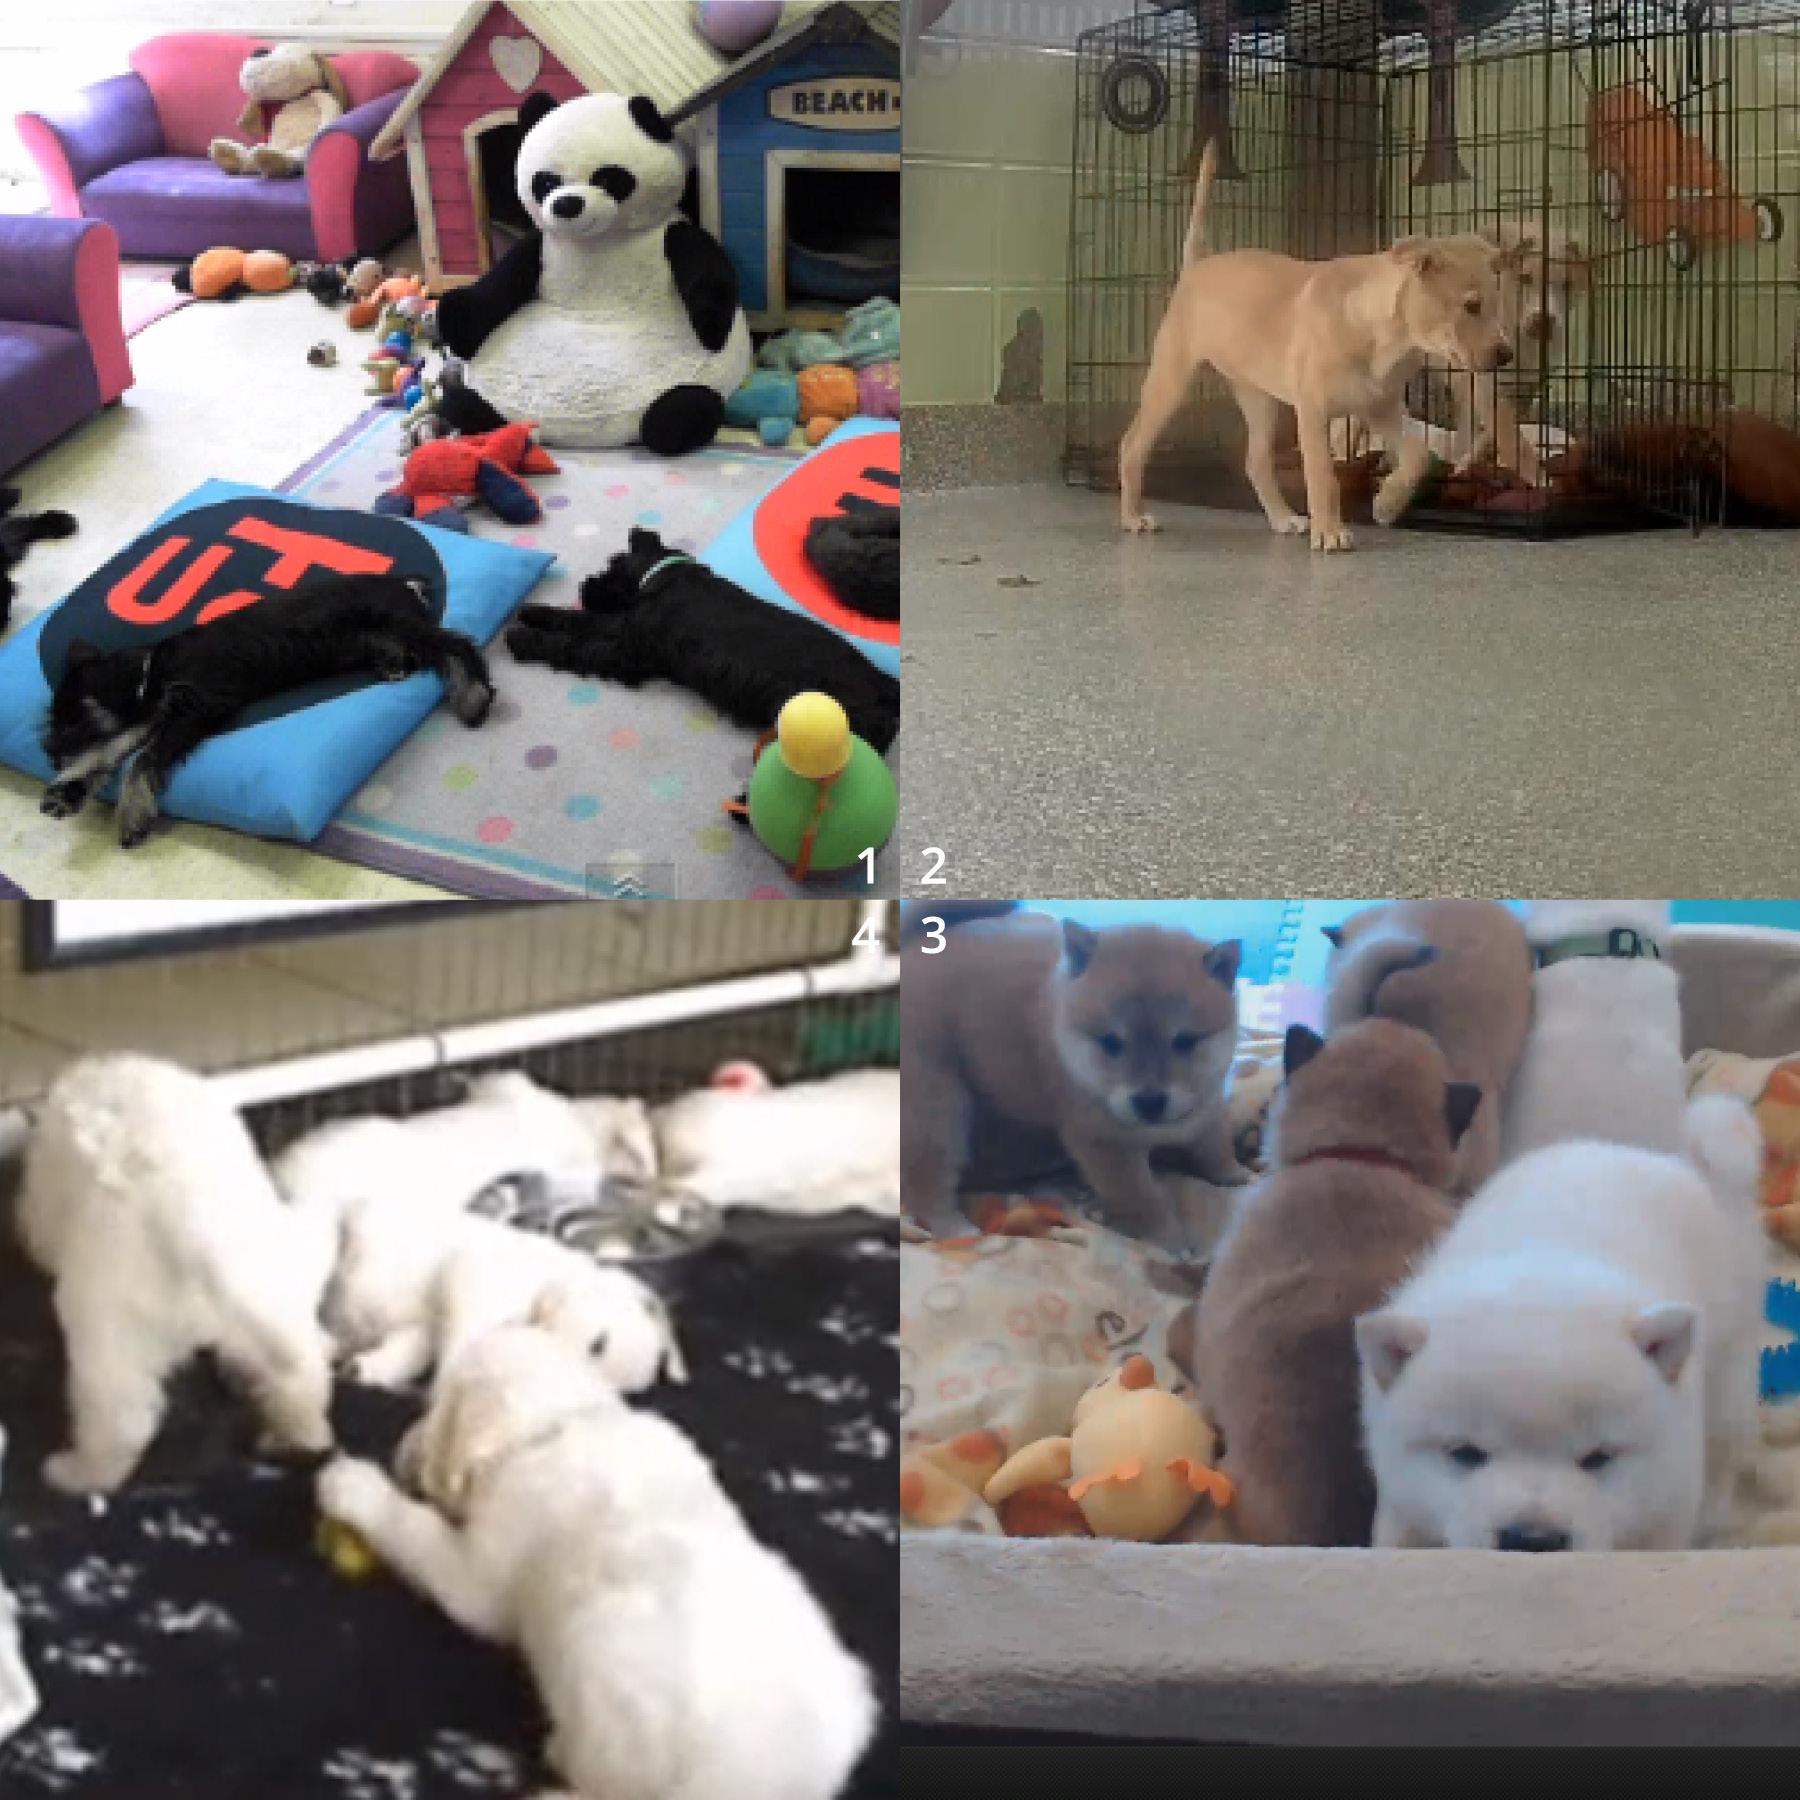 Clockwise, from top left: 1  Miniature Schnauzers  2 Labrador Retrievers  3 Shiba Inus  4 Golden Retrievers